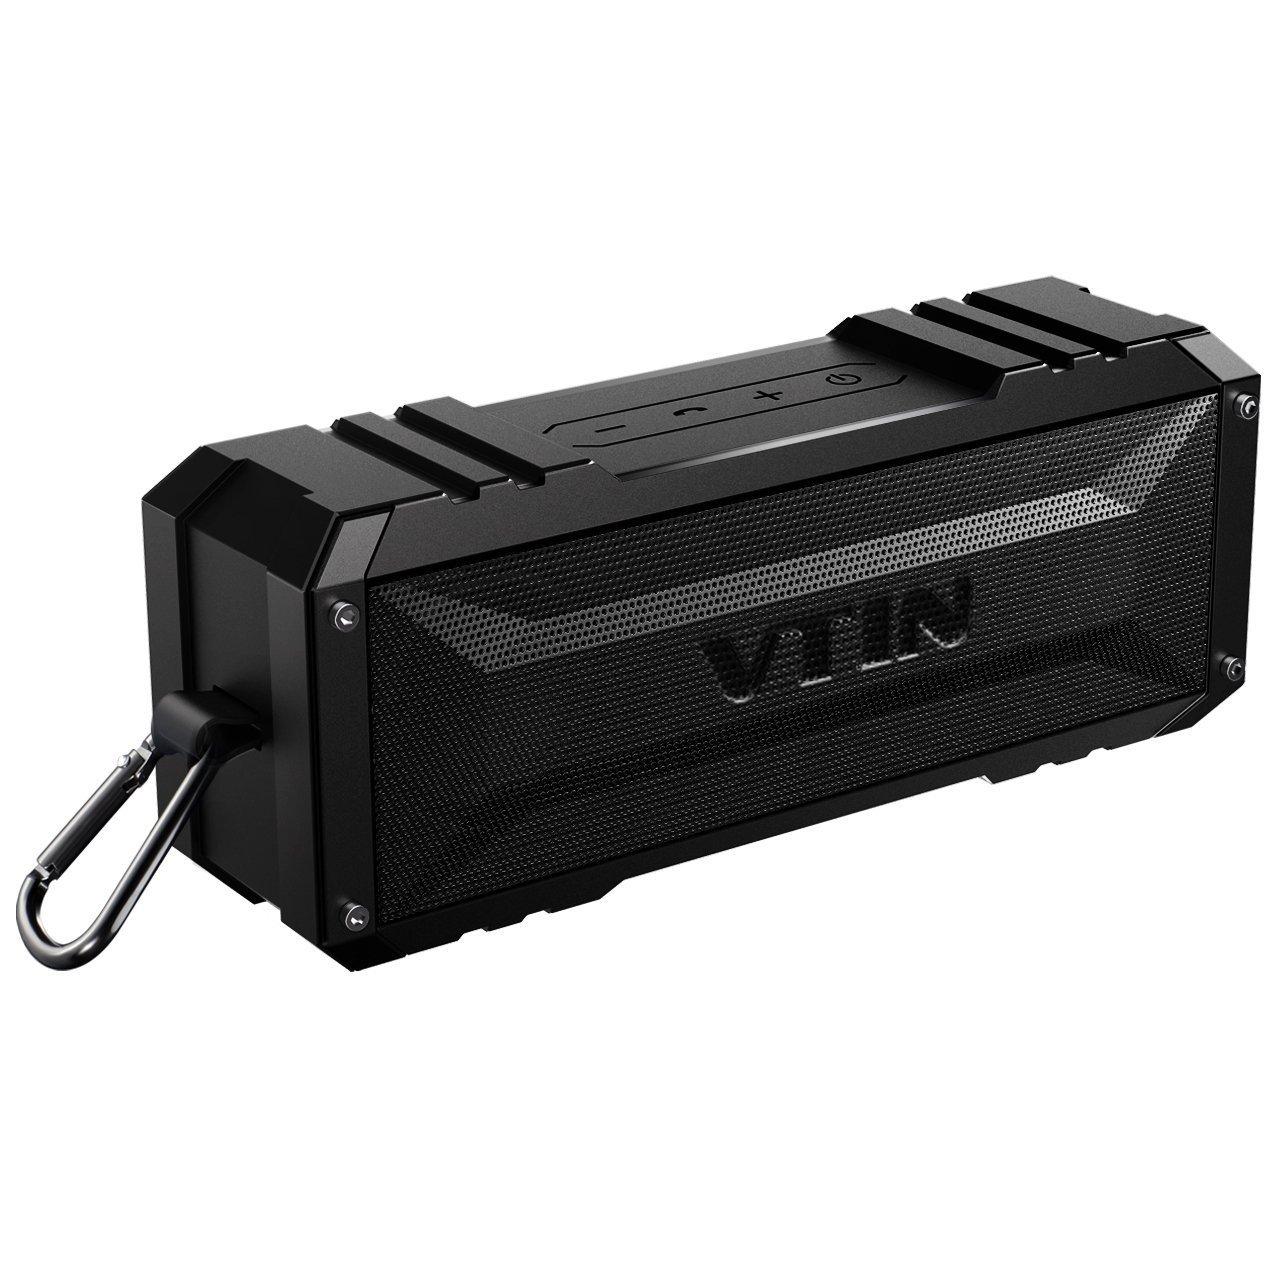 VicTsing Altavoz Bluetooth Estéreo Premium W Con Radiador Pasivo Altavoz inalámbrico portátil